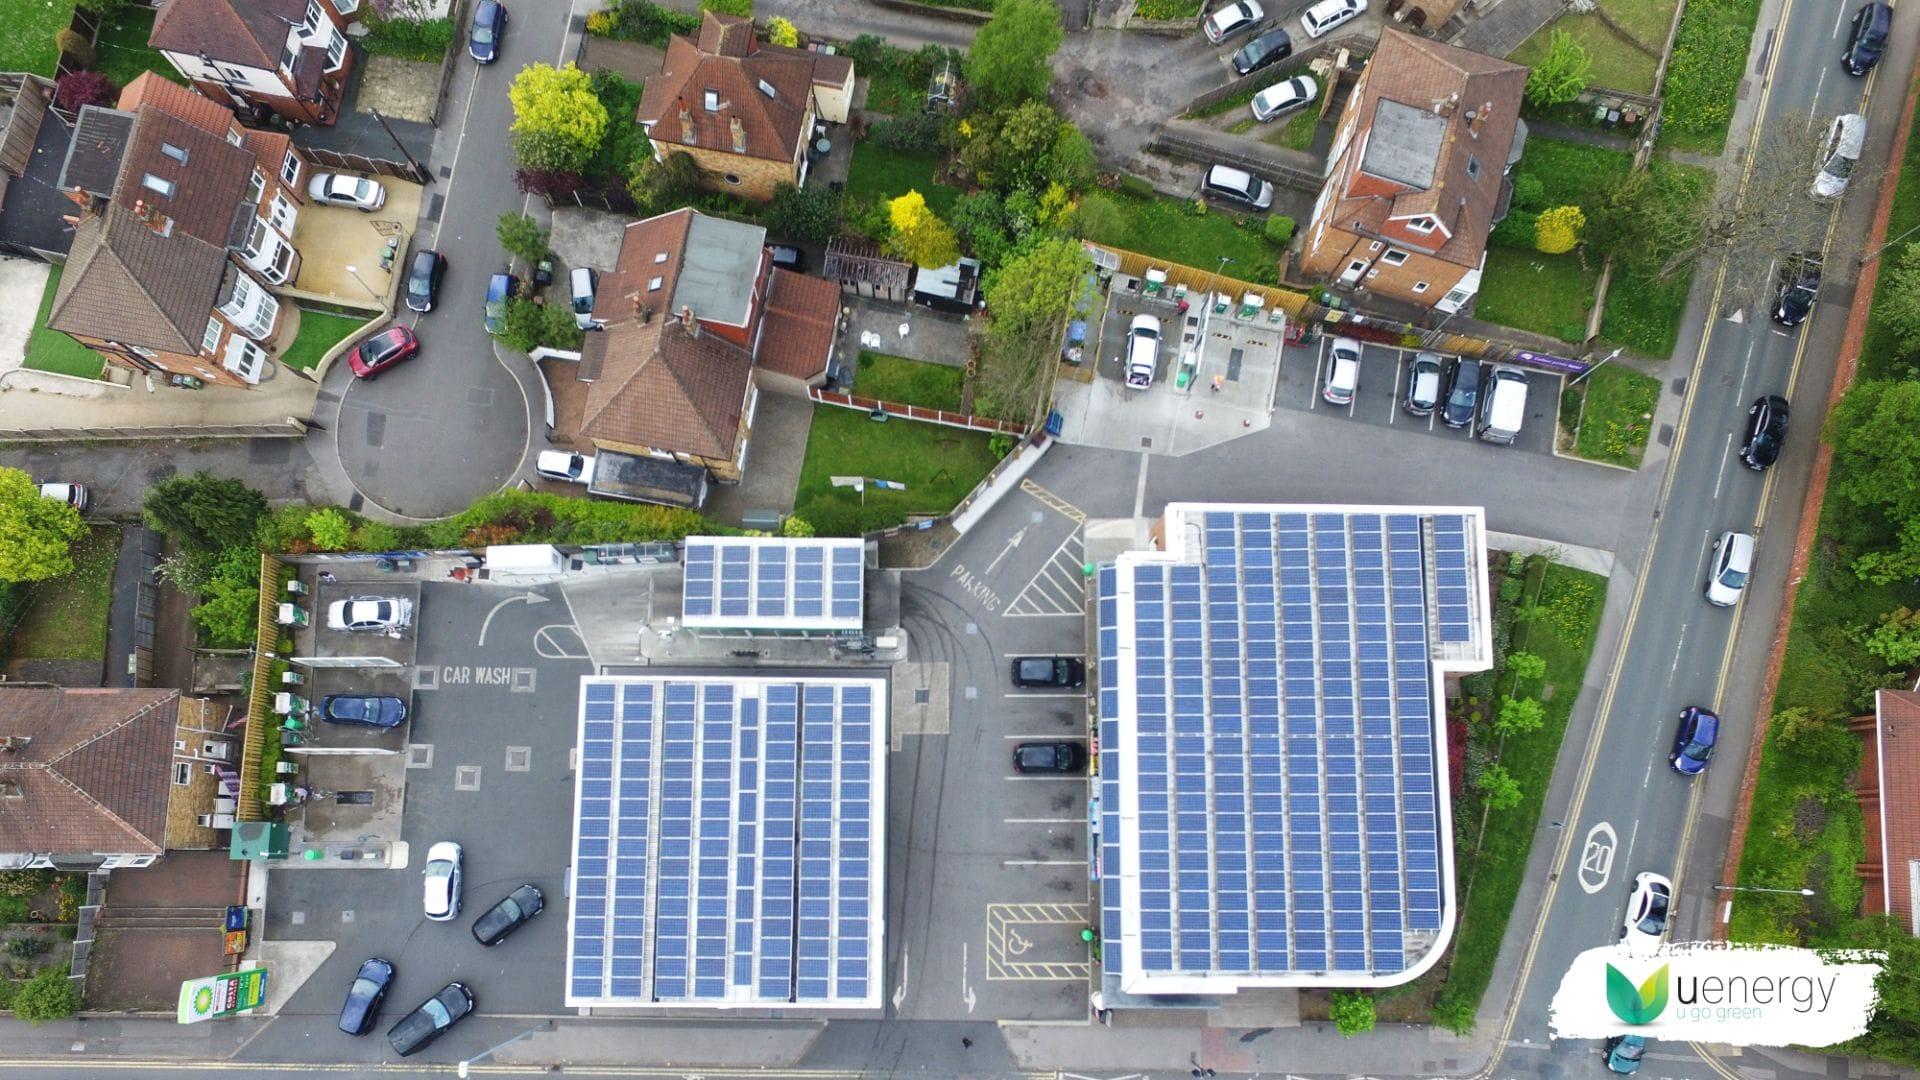 Solar Panels System At Euro Garages Petrol Station by U Energy Solar UK